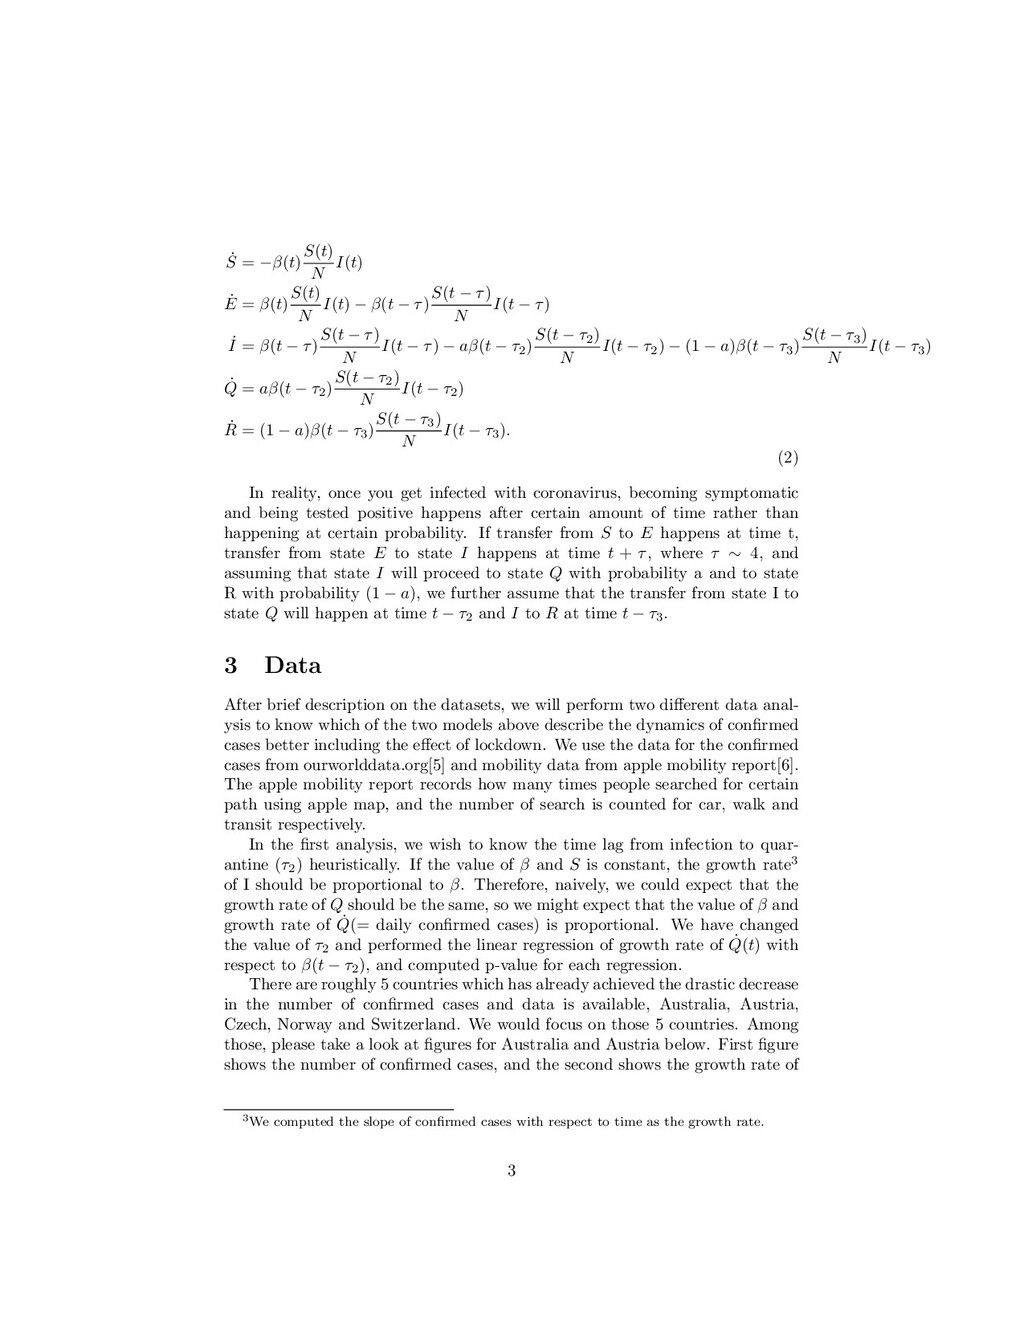 ˙ S = −β(t) S(t) N I(t) ˙ E = β(t) S(t) N I(t) ...